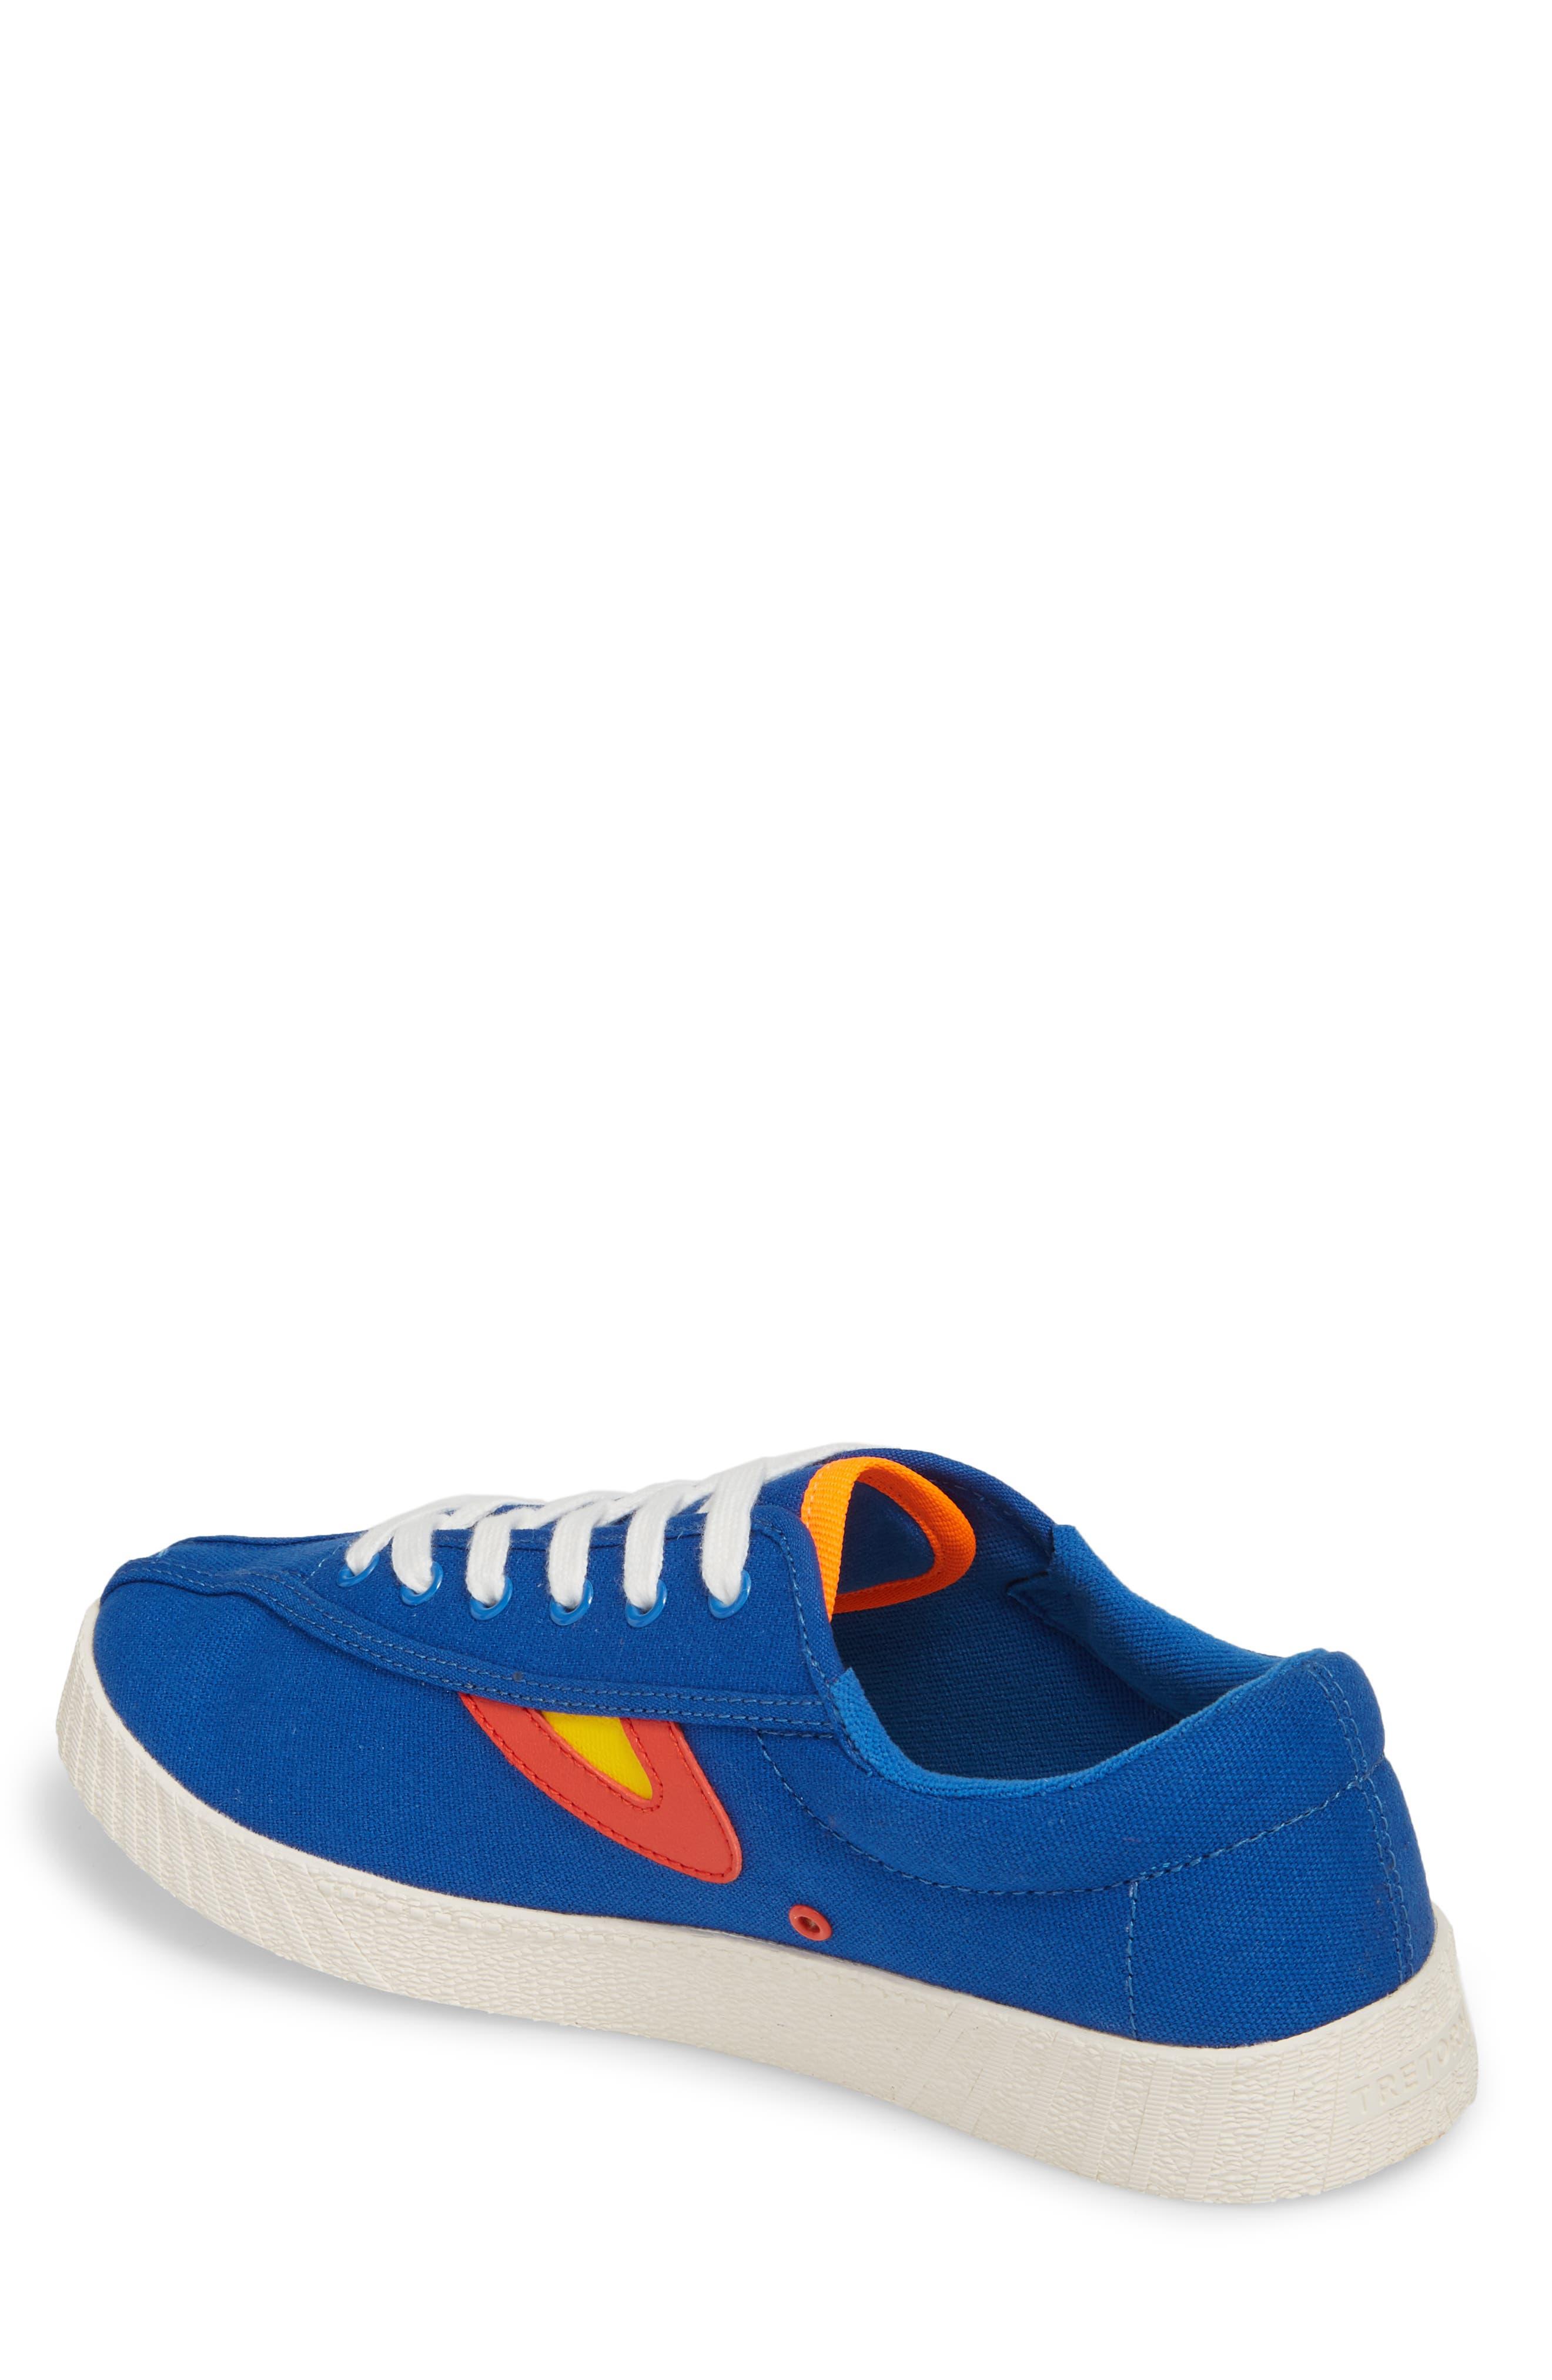 Alternate Image 2  - Tretorn Andre 3000 Nylite Low Top Sneaker (Men)